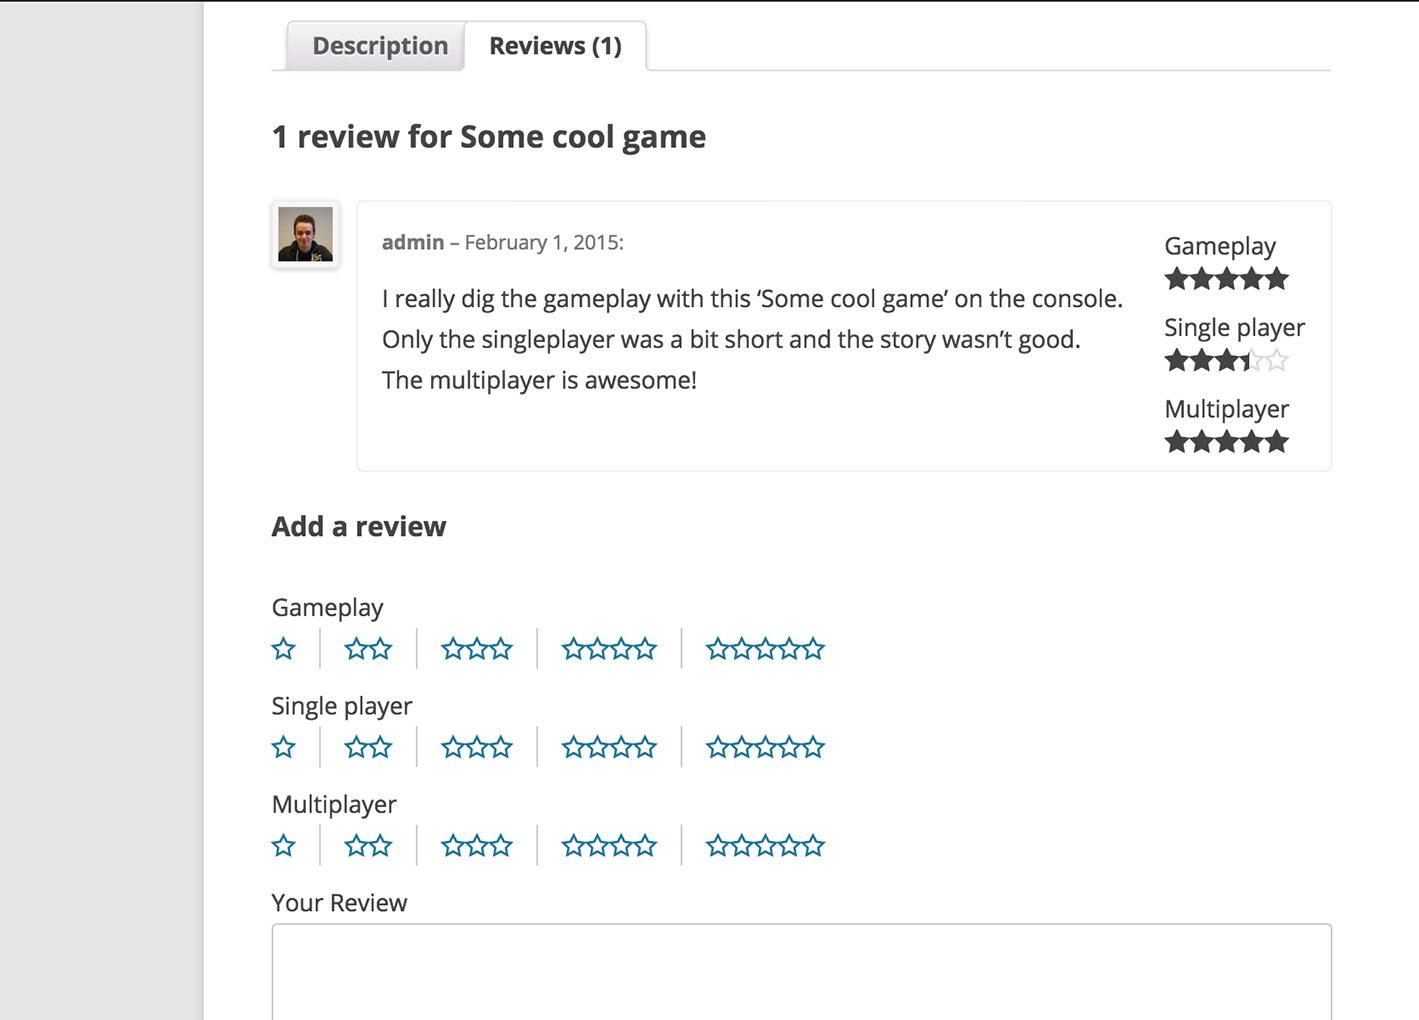 Reviews and description